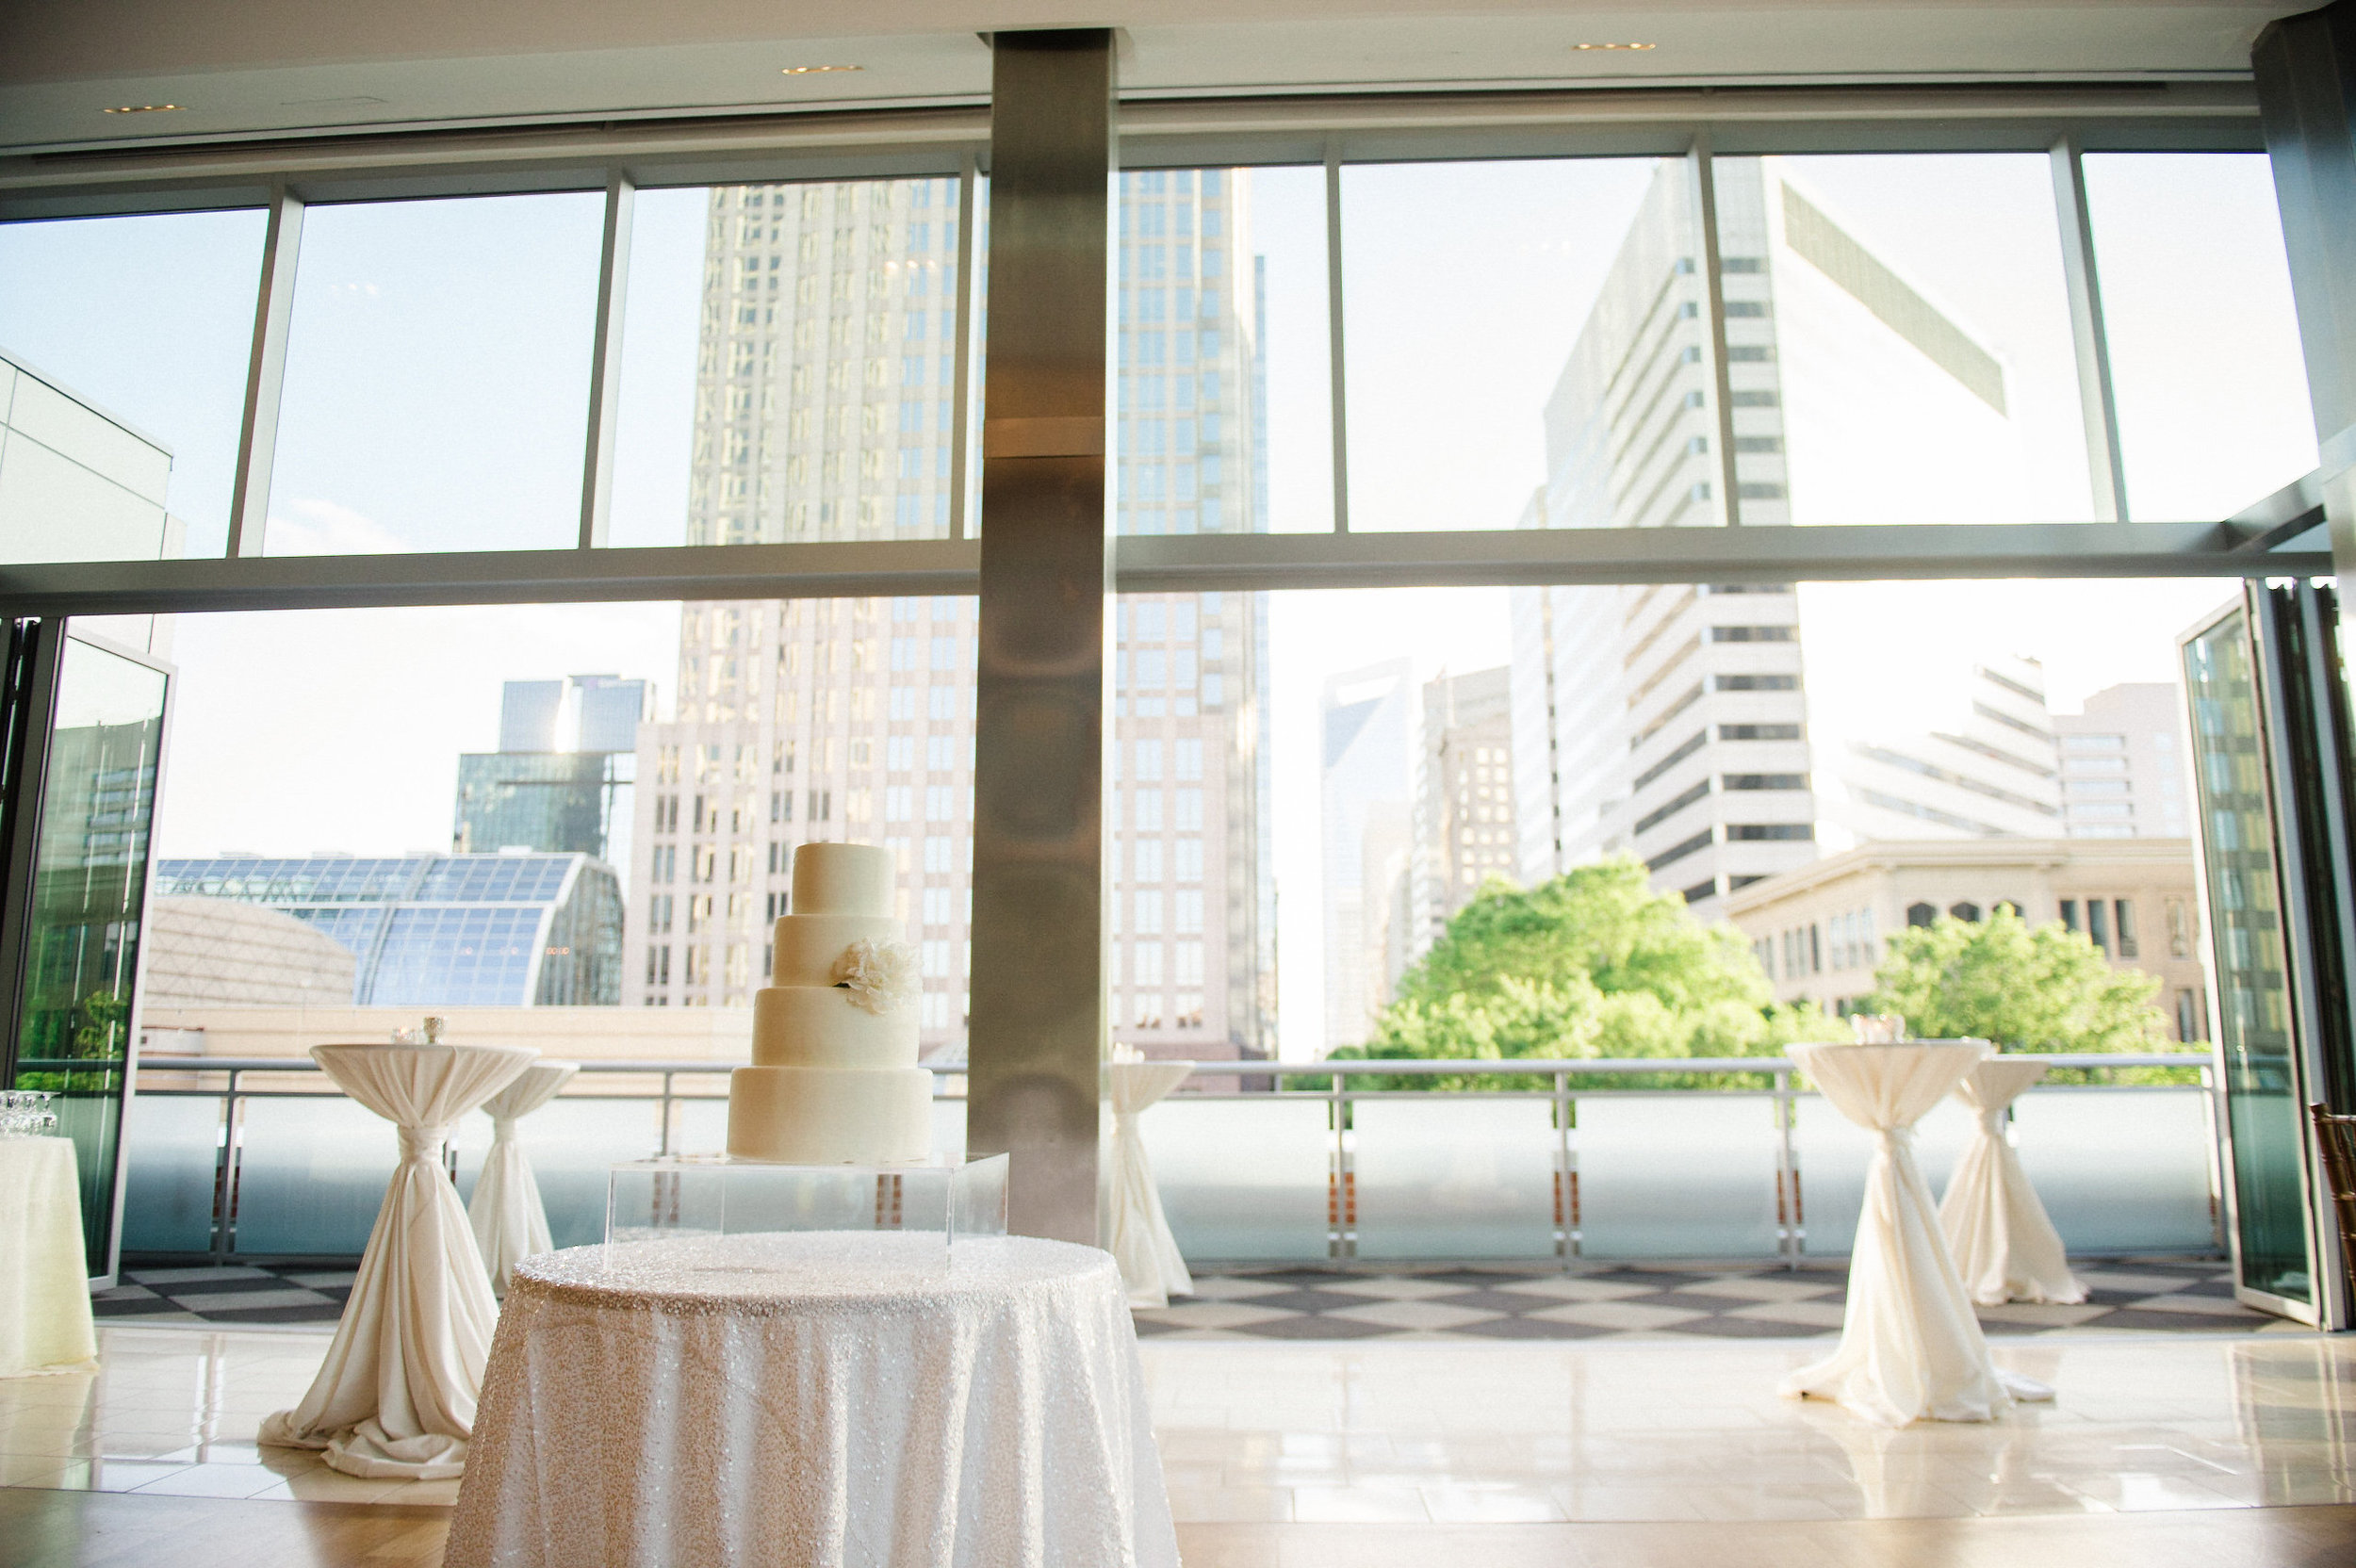 shelby&jordan|smitten&hooked|wedding|details-077.jpg